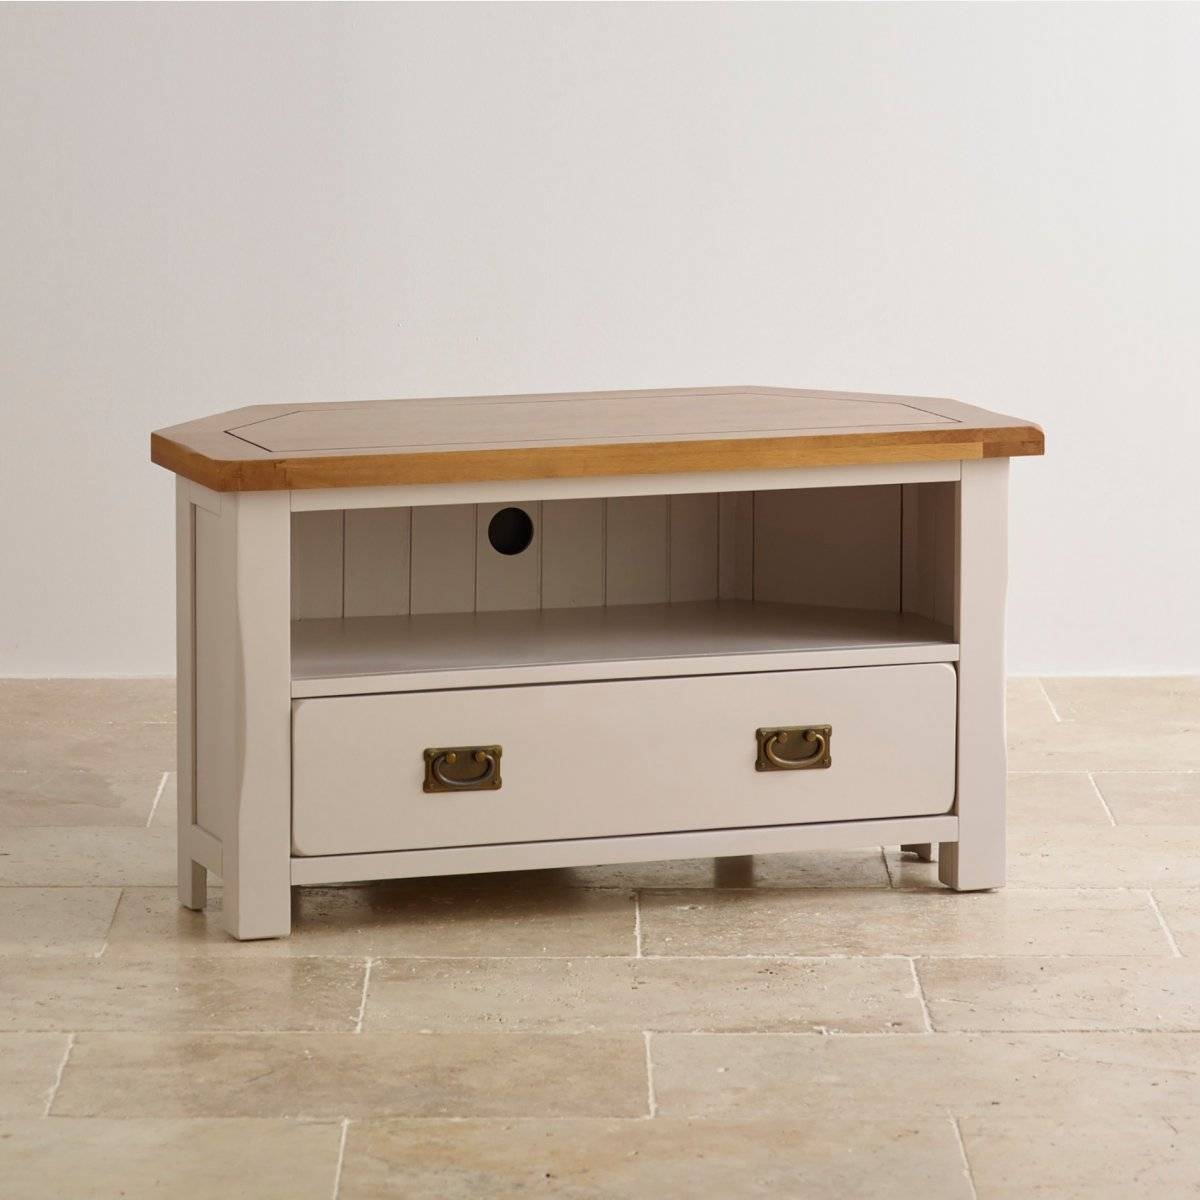 Painted Corner Tv Cabinet In Rustic Oak | Oak Furniture Land regarding Rustic Corner Tv Cabinets (Image 6 of 15)